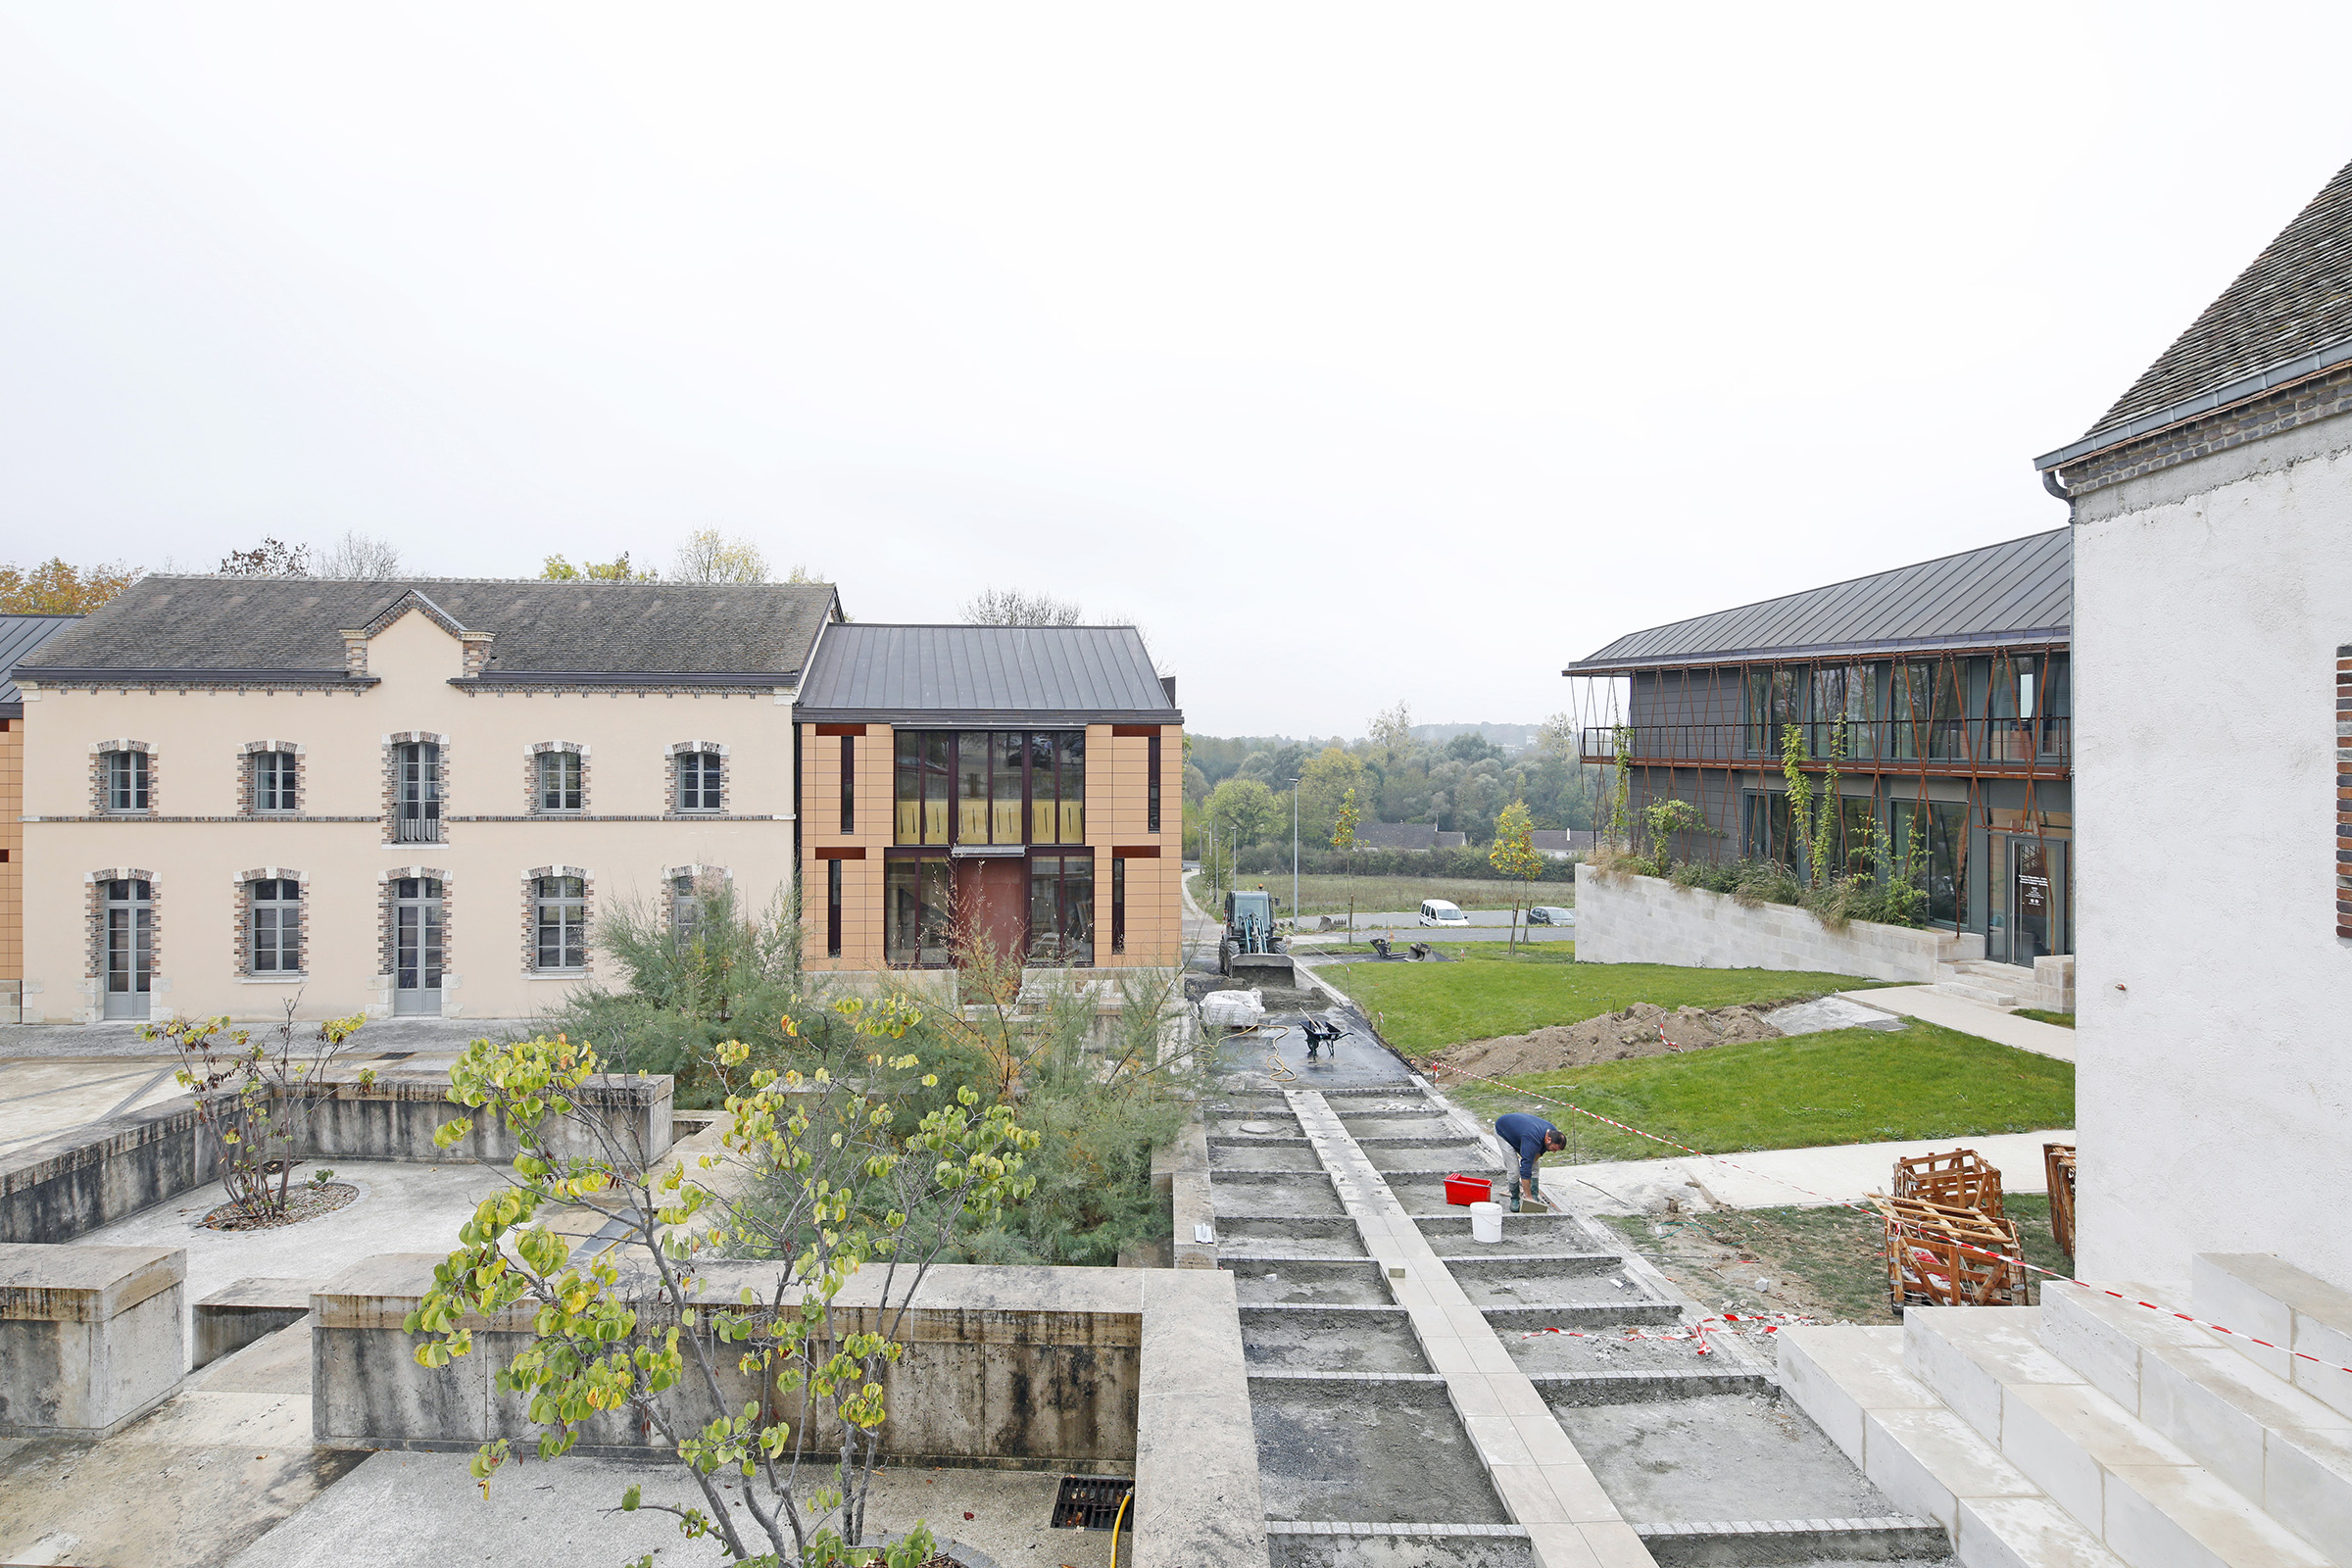 Amilly - La Maison Saint Loup - Sylvain Dubuisson 001.jpg